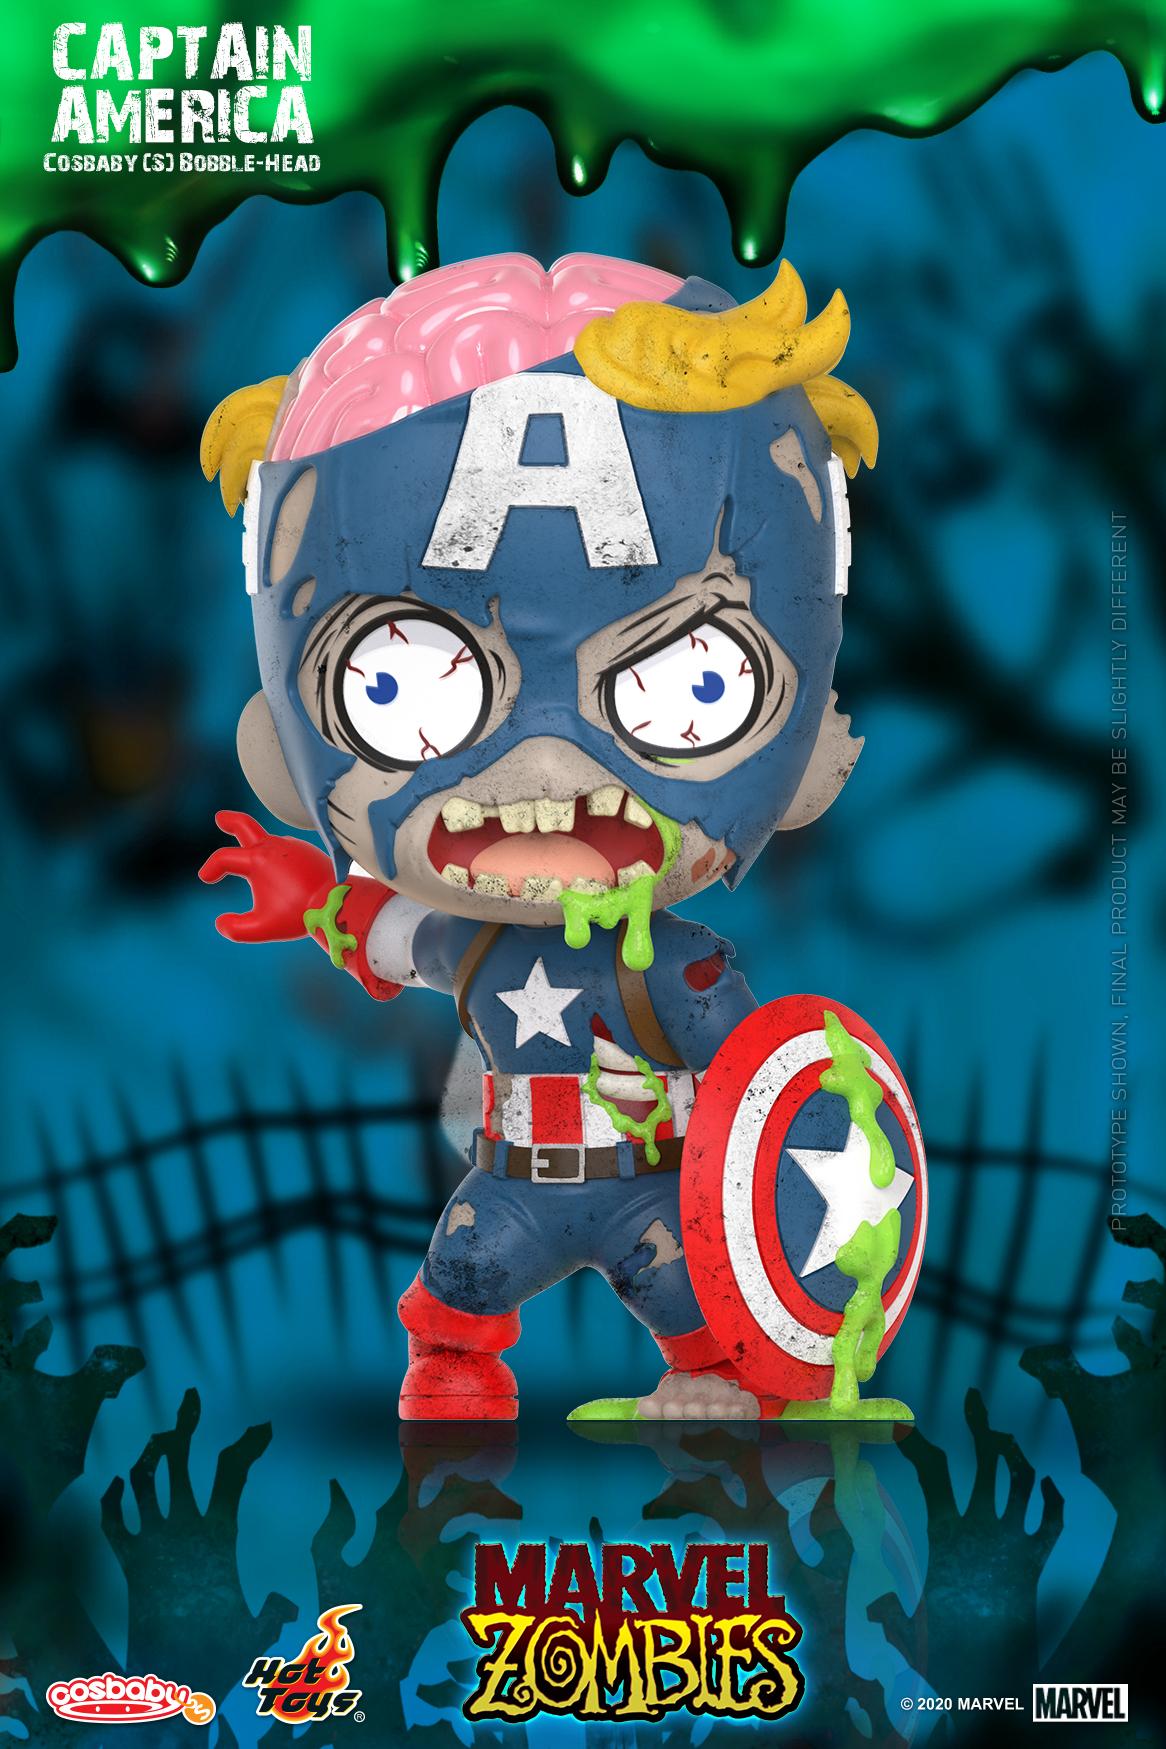 Hot-Toys-Marvel-Zombie-Captain-America-Cosbaby-S_PR1-1